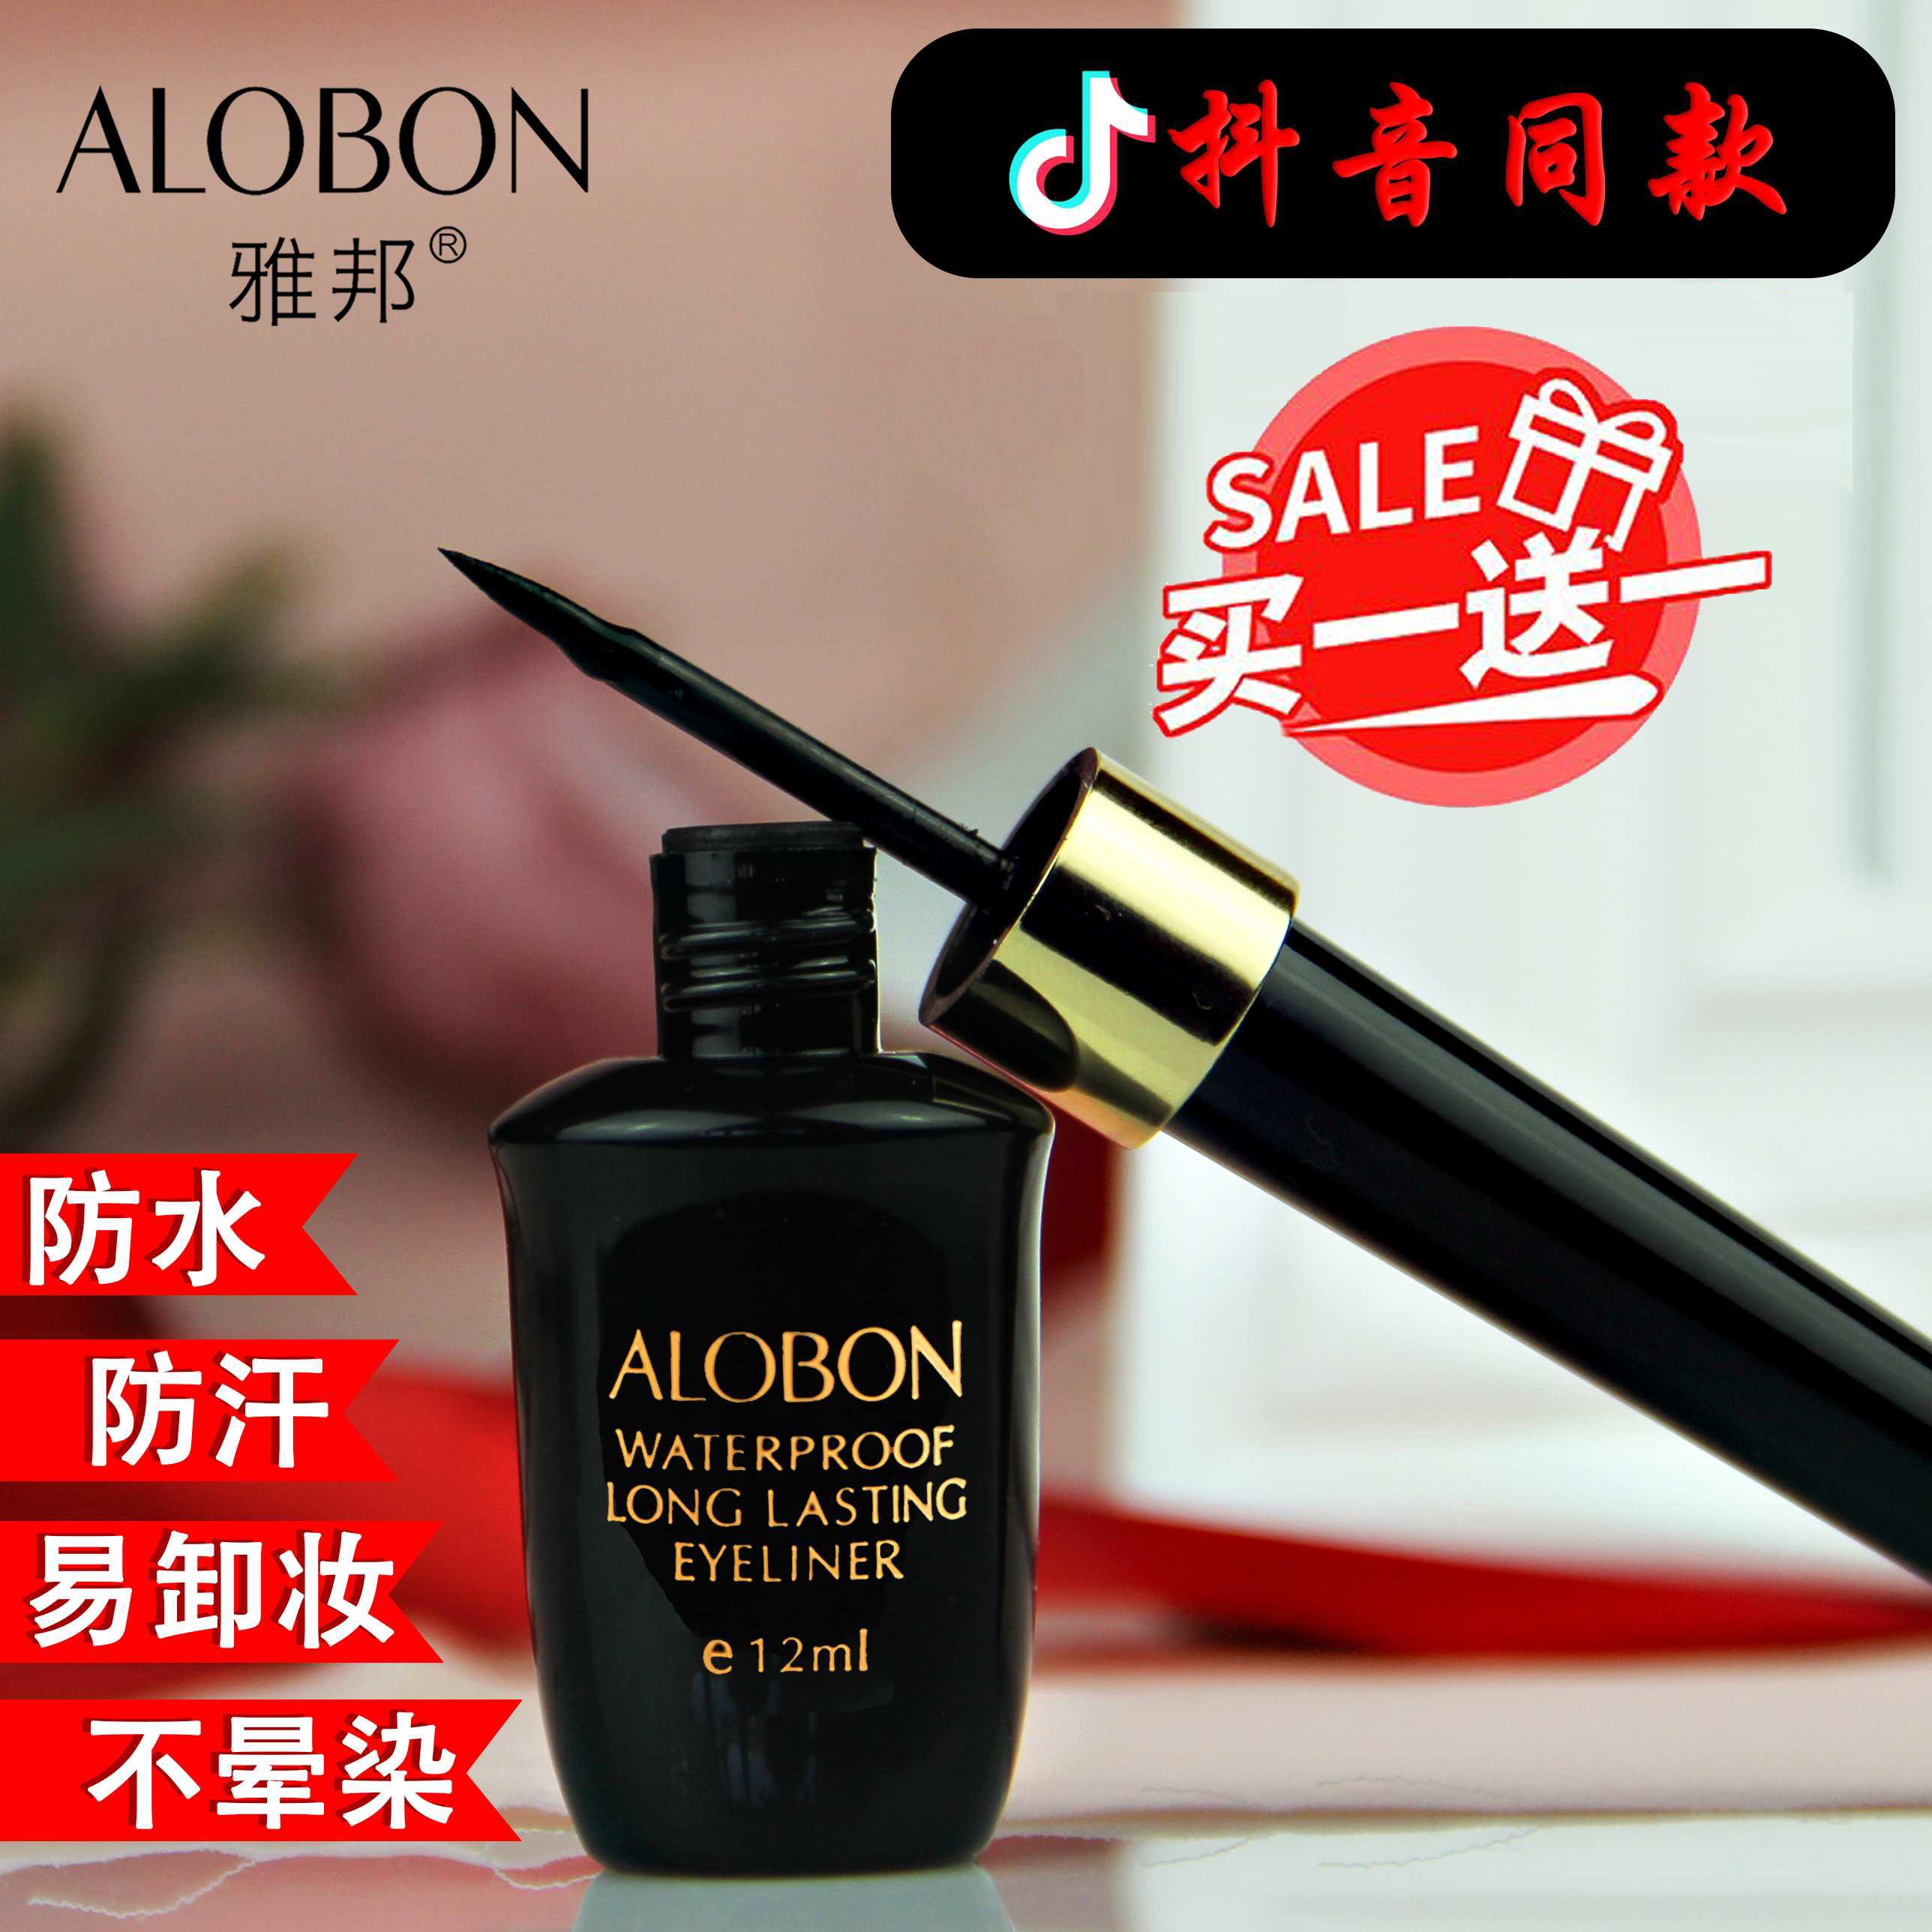 Yabong durable waterproof eye liner 12ml eyeliner pencil, gel Pencil Eyeliner paste, hard head, quick drying, sweat resistance, no dizzy dyeing.